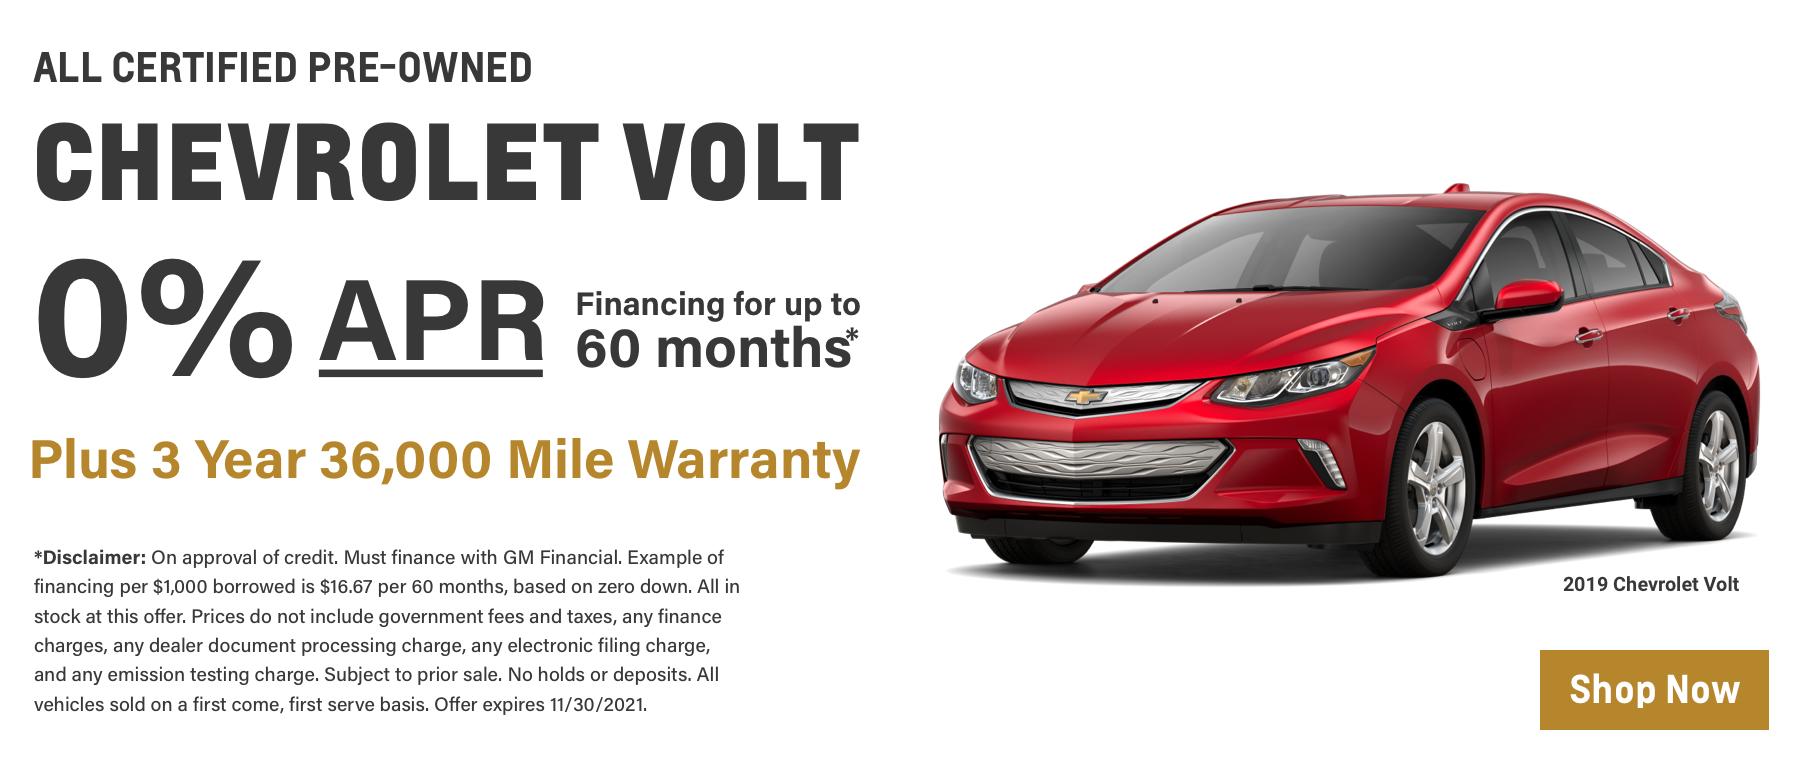 OCT CPO Chevrolet Volt Updated